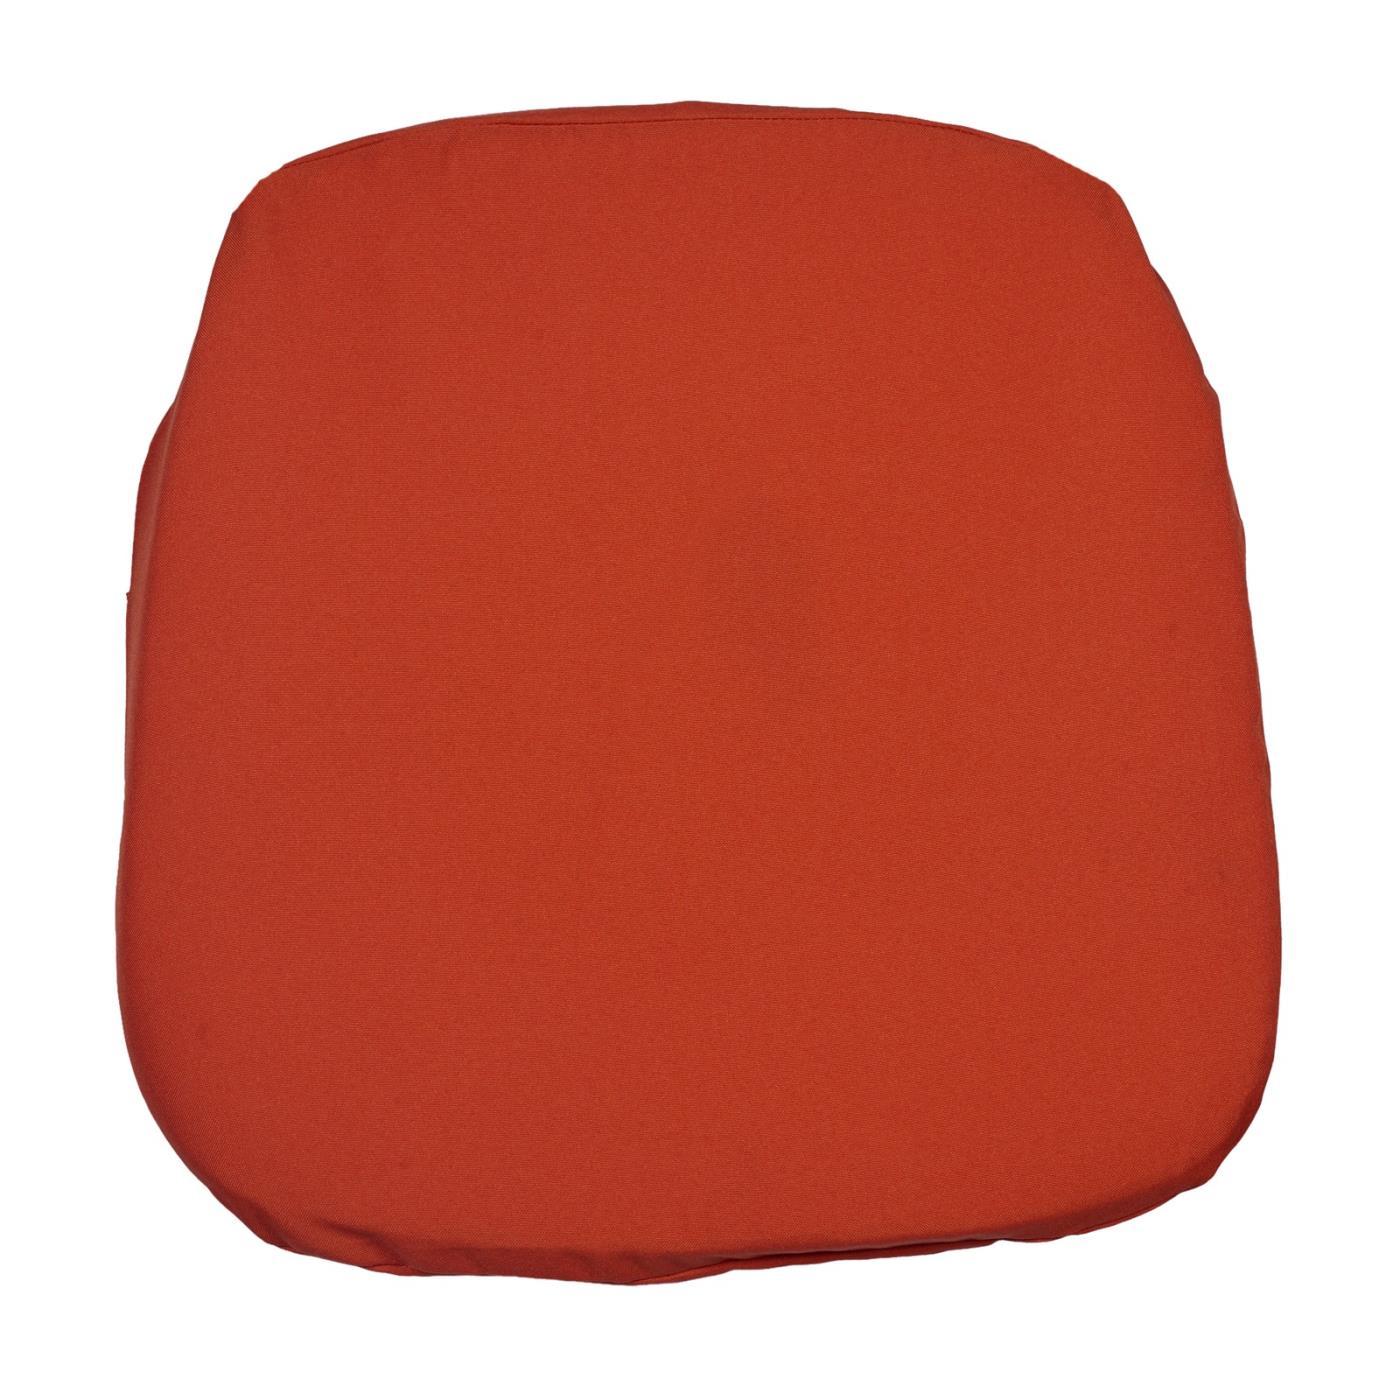 Poly Seat Cushion - Orange